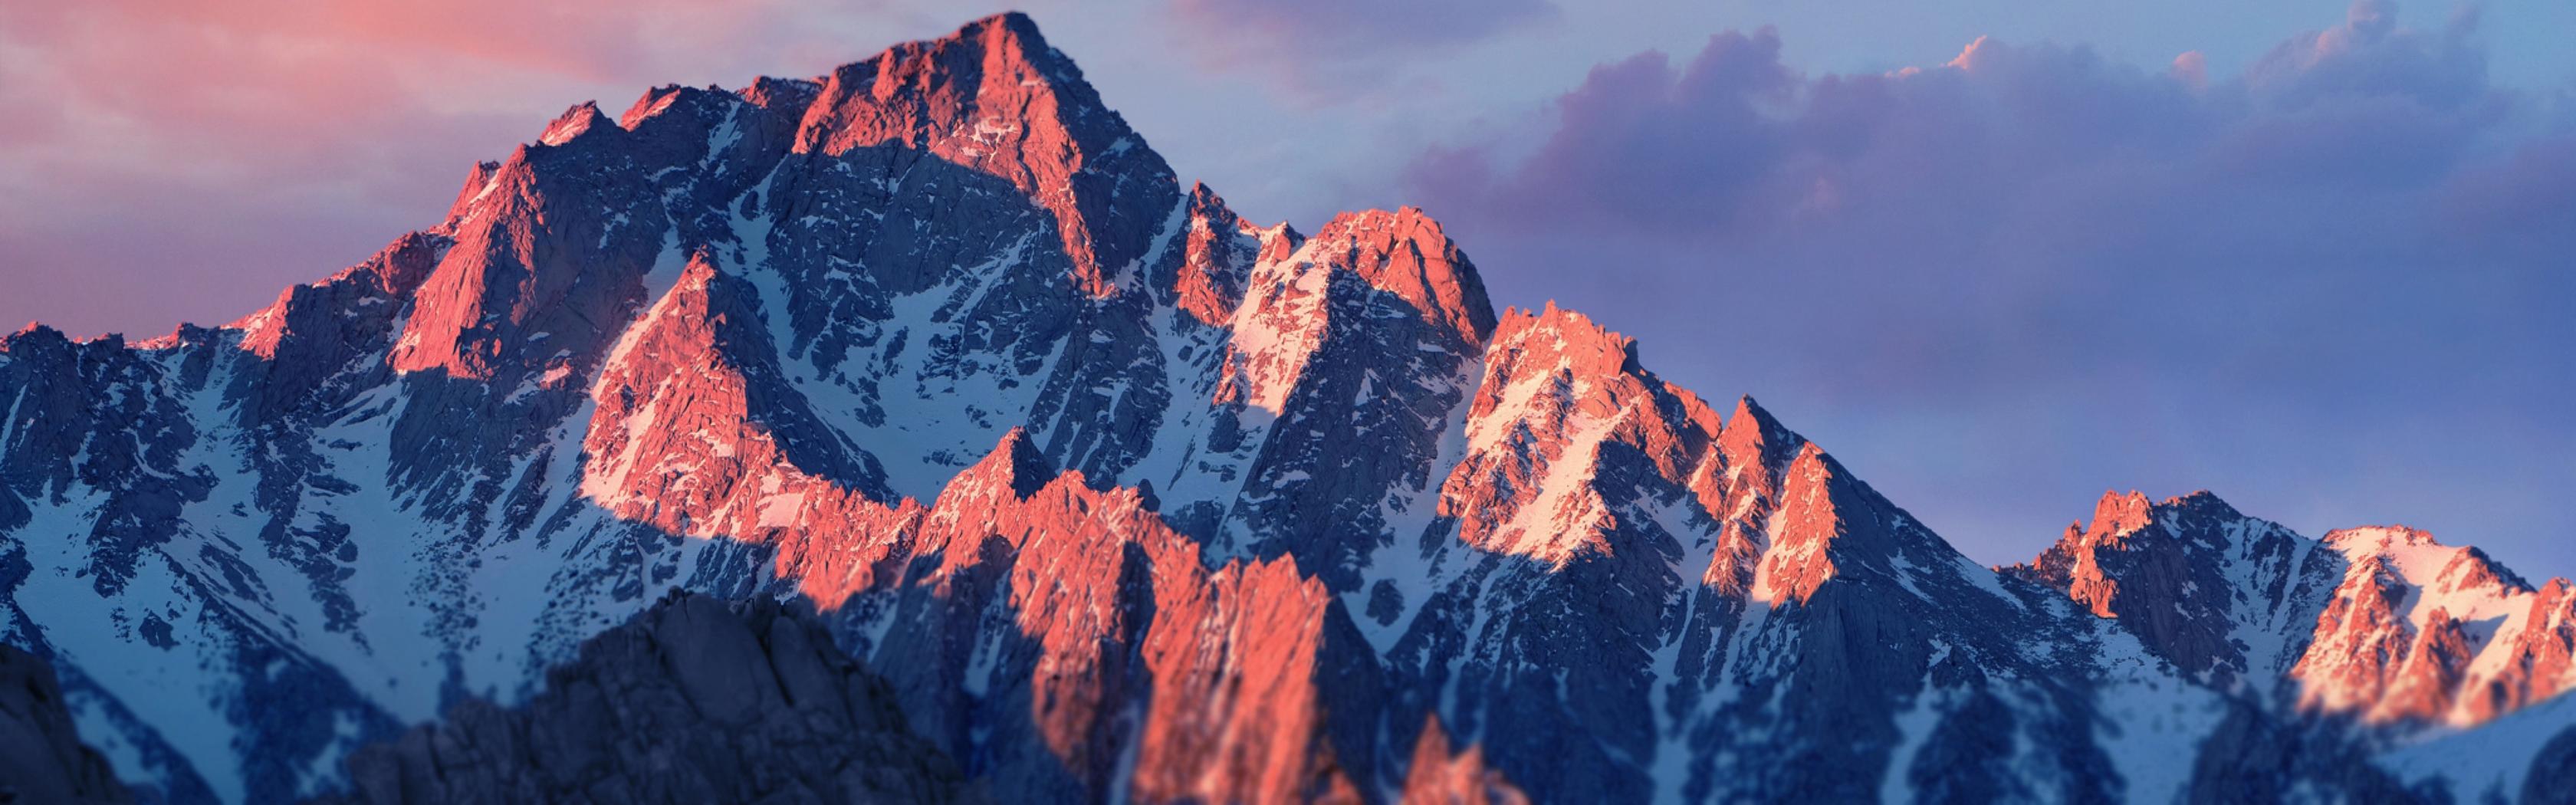 macOS-Sierra-Wallpaper-4kMOD by nardoxic